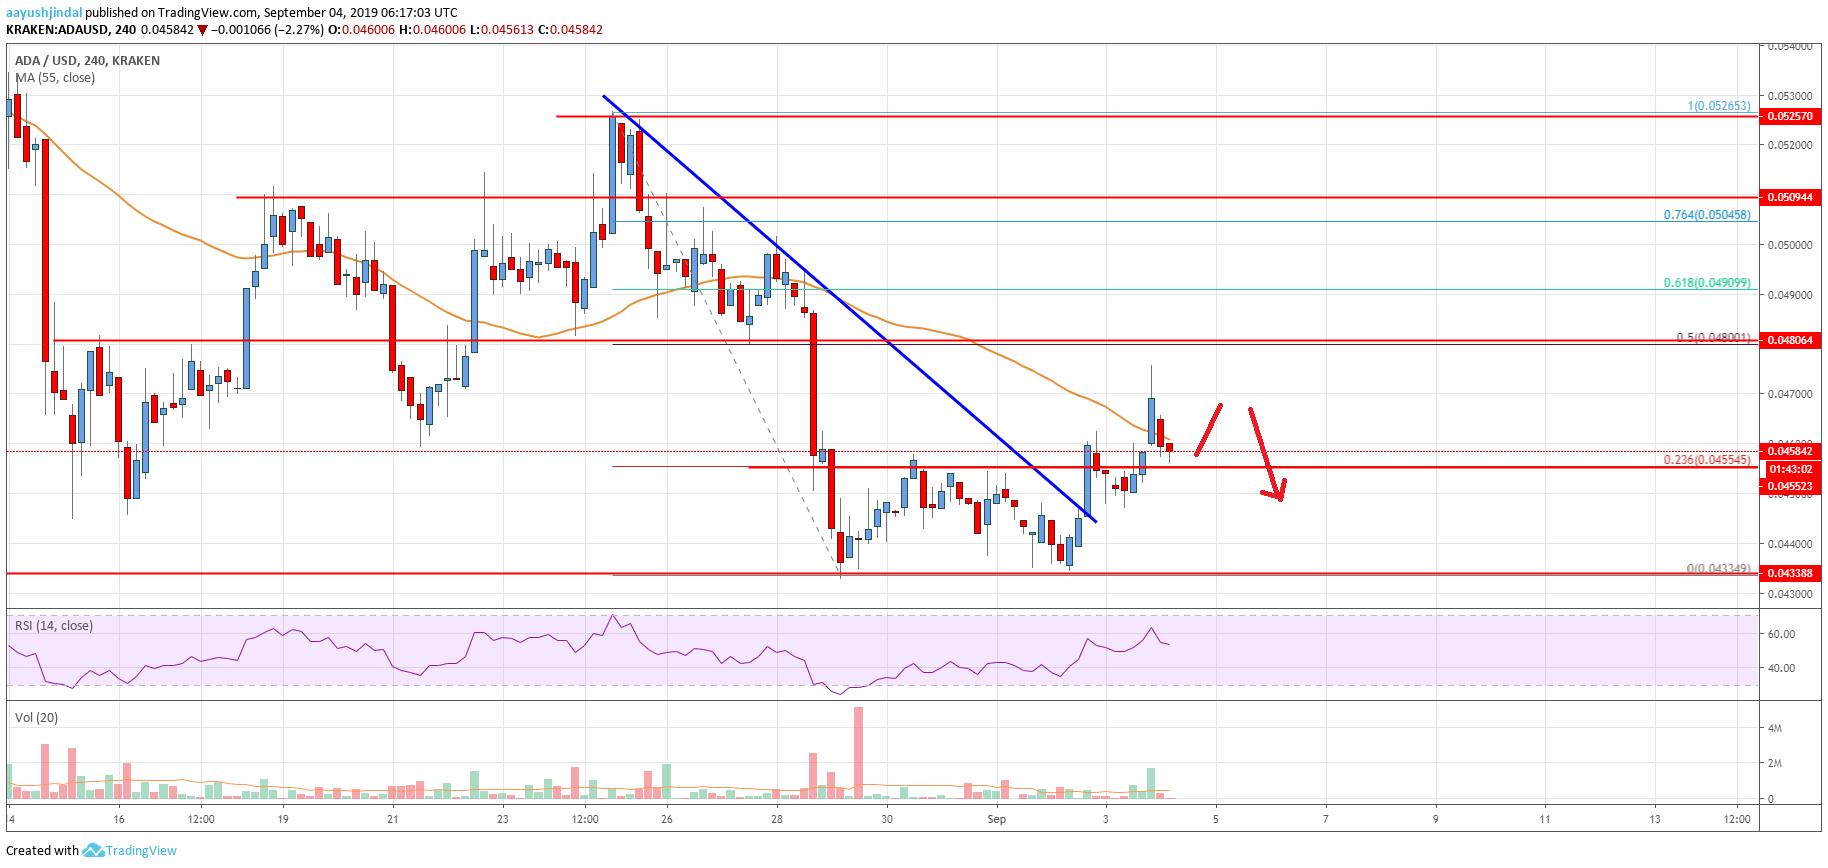 Cardano ADA price analysis: Will it pull well past $0.0456? 2